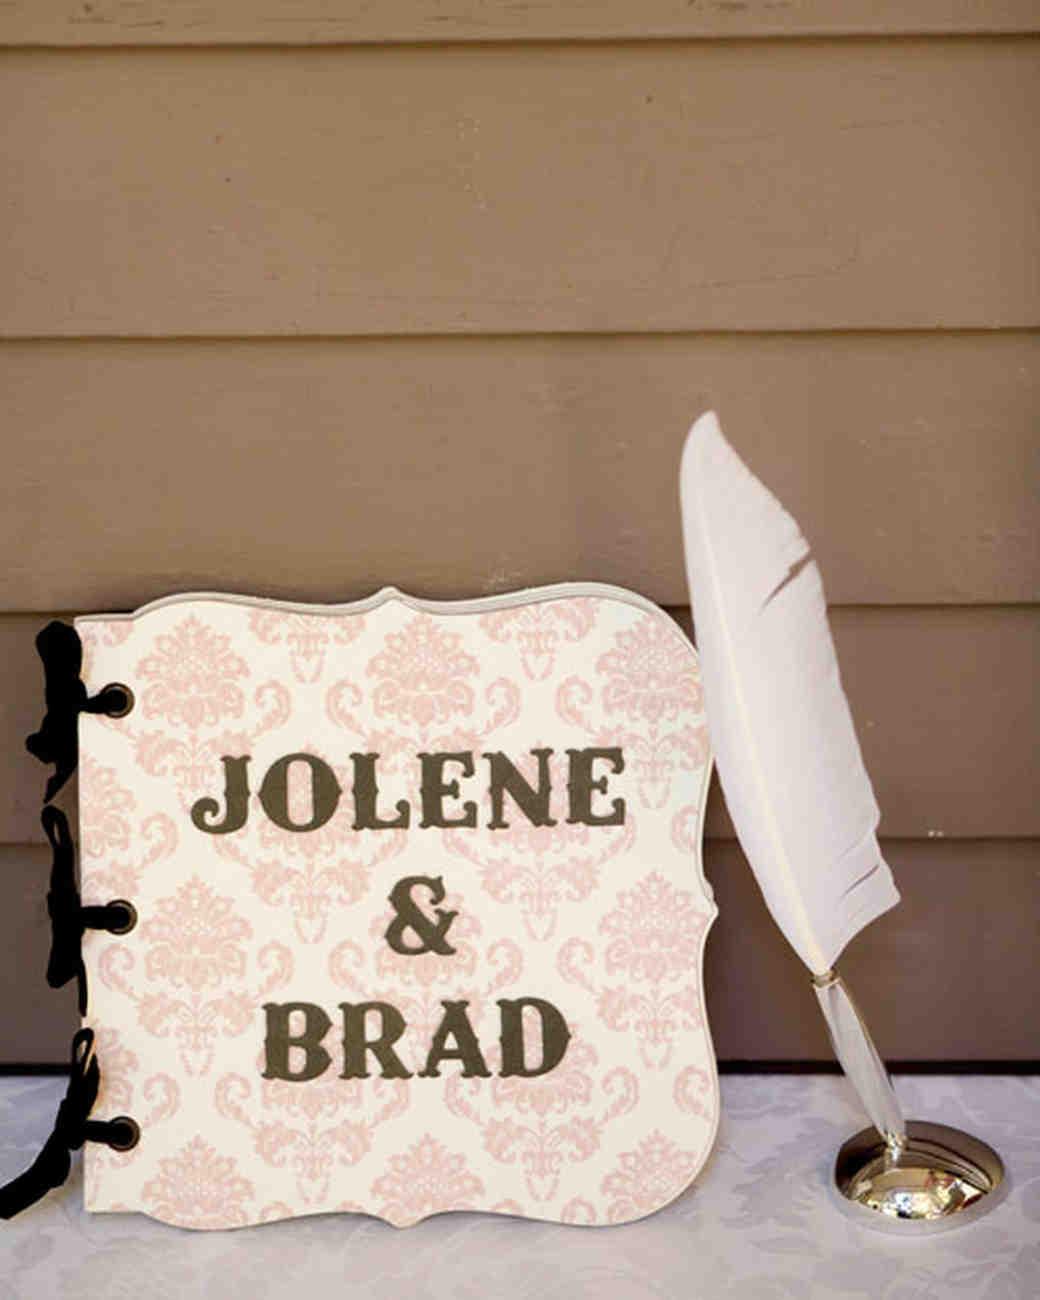 rw_0211_jolene_brad_guestbook.jpg